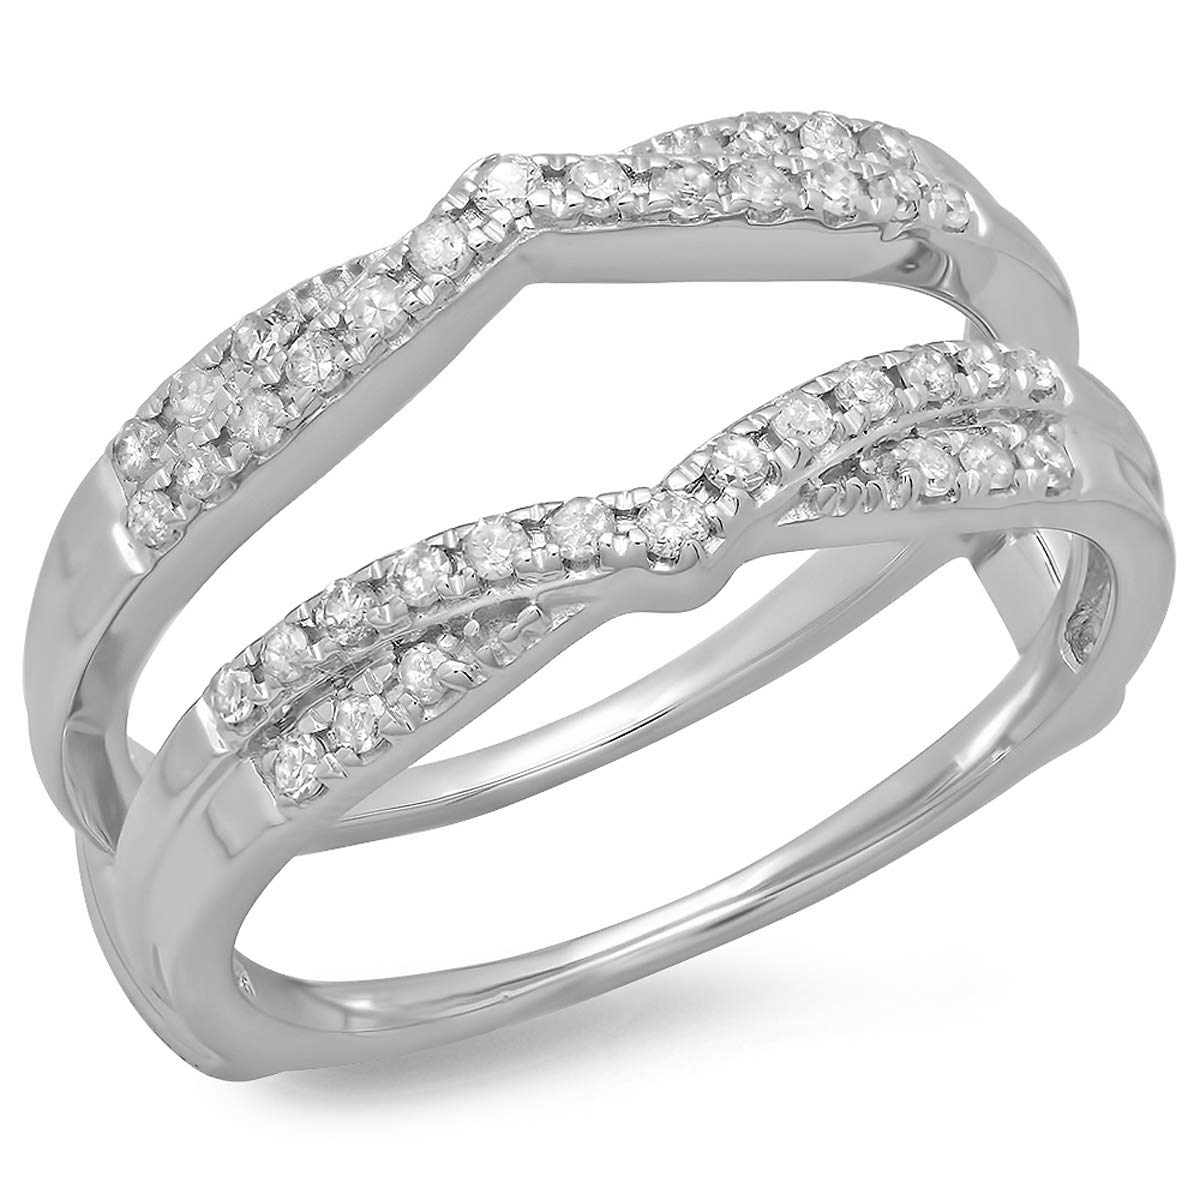 Dazzlingrock Collection 0.33 Carat (ctw) 14K Round Diamond Wedding Band Guard Double Chevron Ring 1/3 CT, White Gold, Size 7